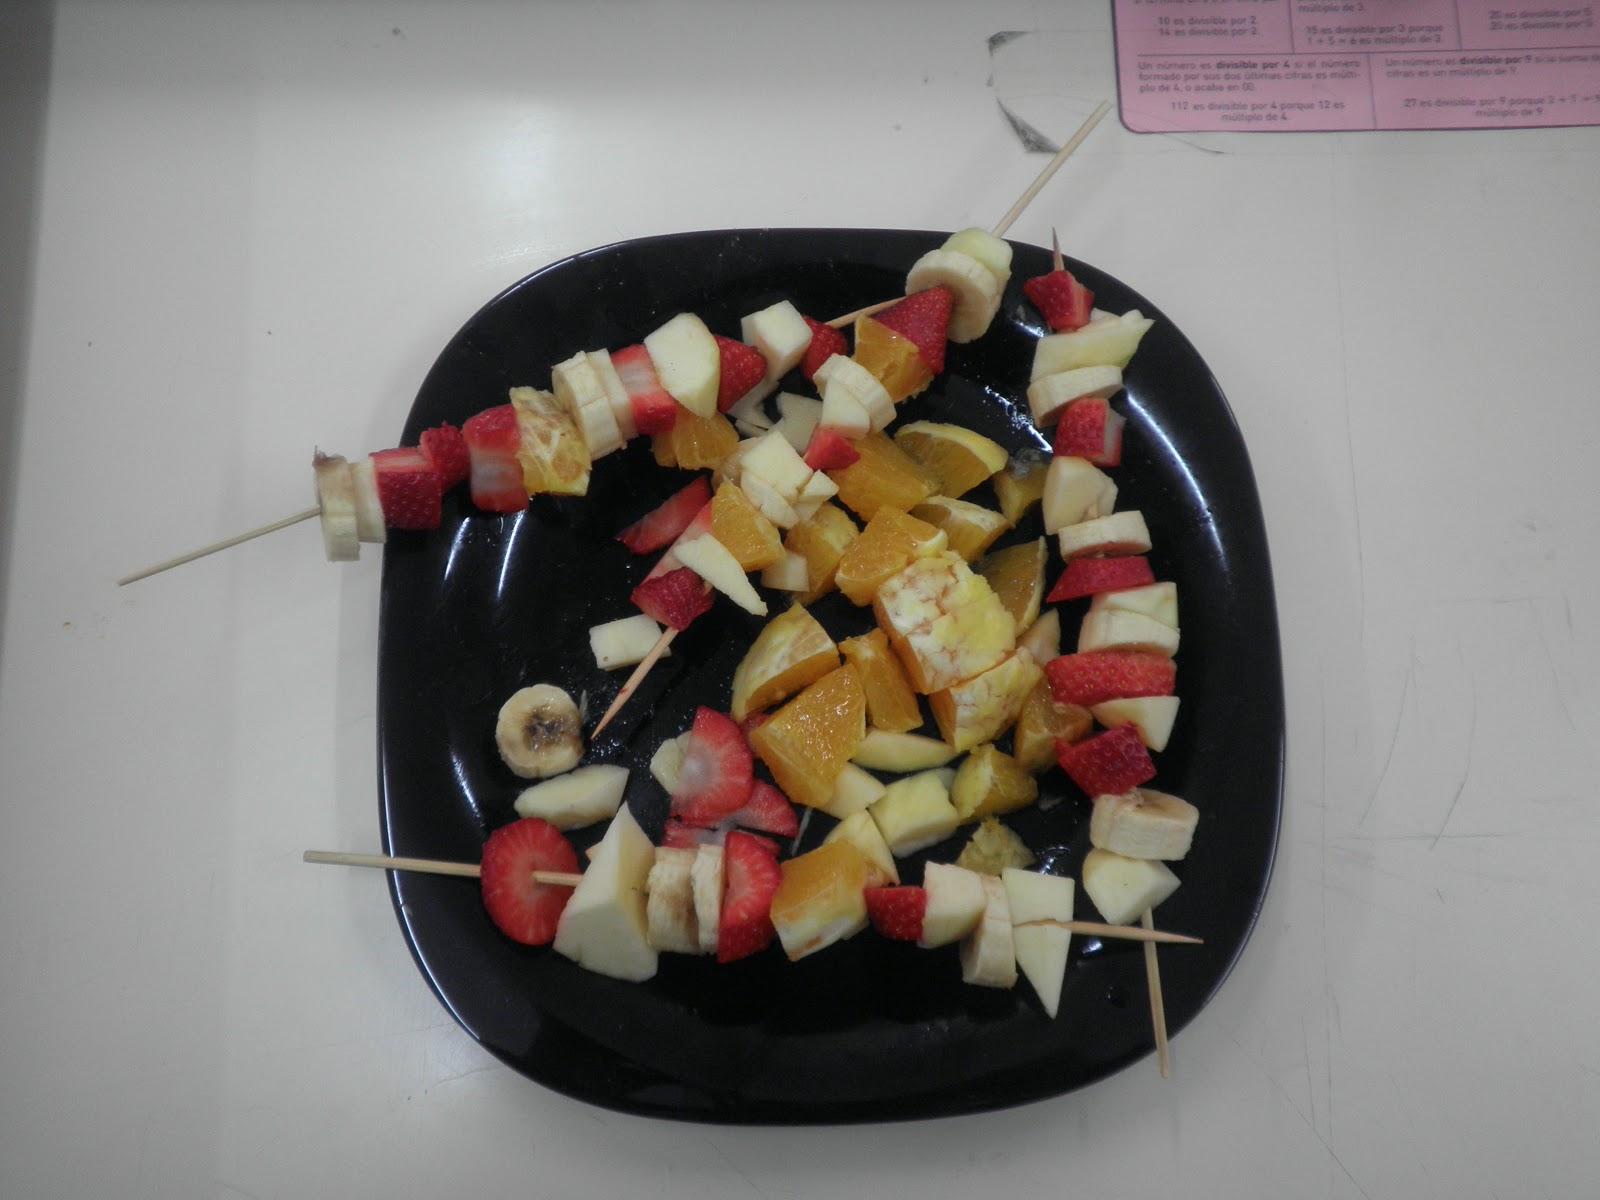 http://2.bp.blogspot.com/-DLOI1CQq5DQ/USsxyCO5KpI/AAAAAAAAEuc/lqNuabFrbxQ/s1600/frutas+con+chocolate+007.jpg